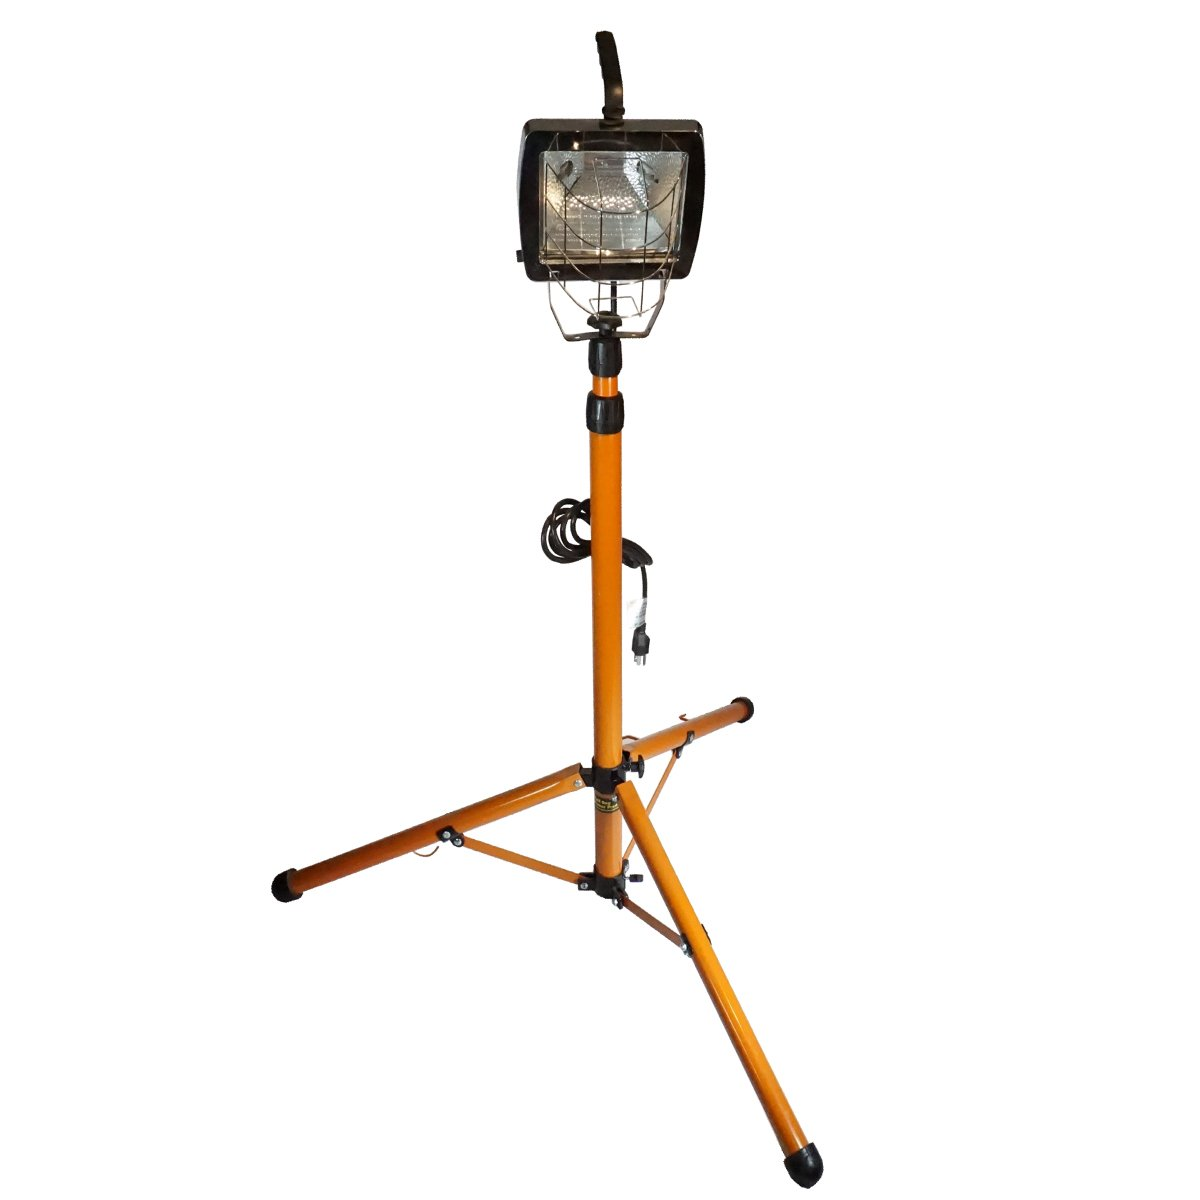 Bull Dog Products by Warner 4-8 ft 500 Watt Halogen Adjustable Work Light